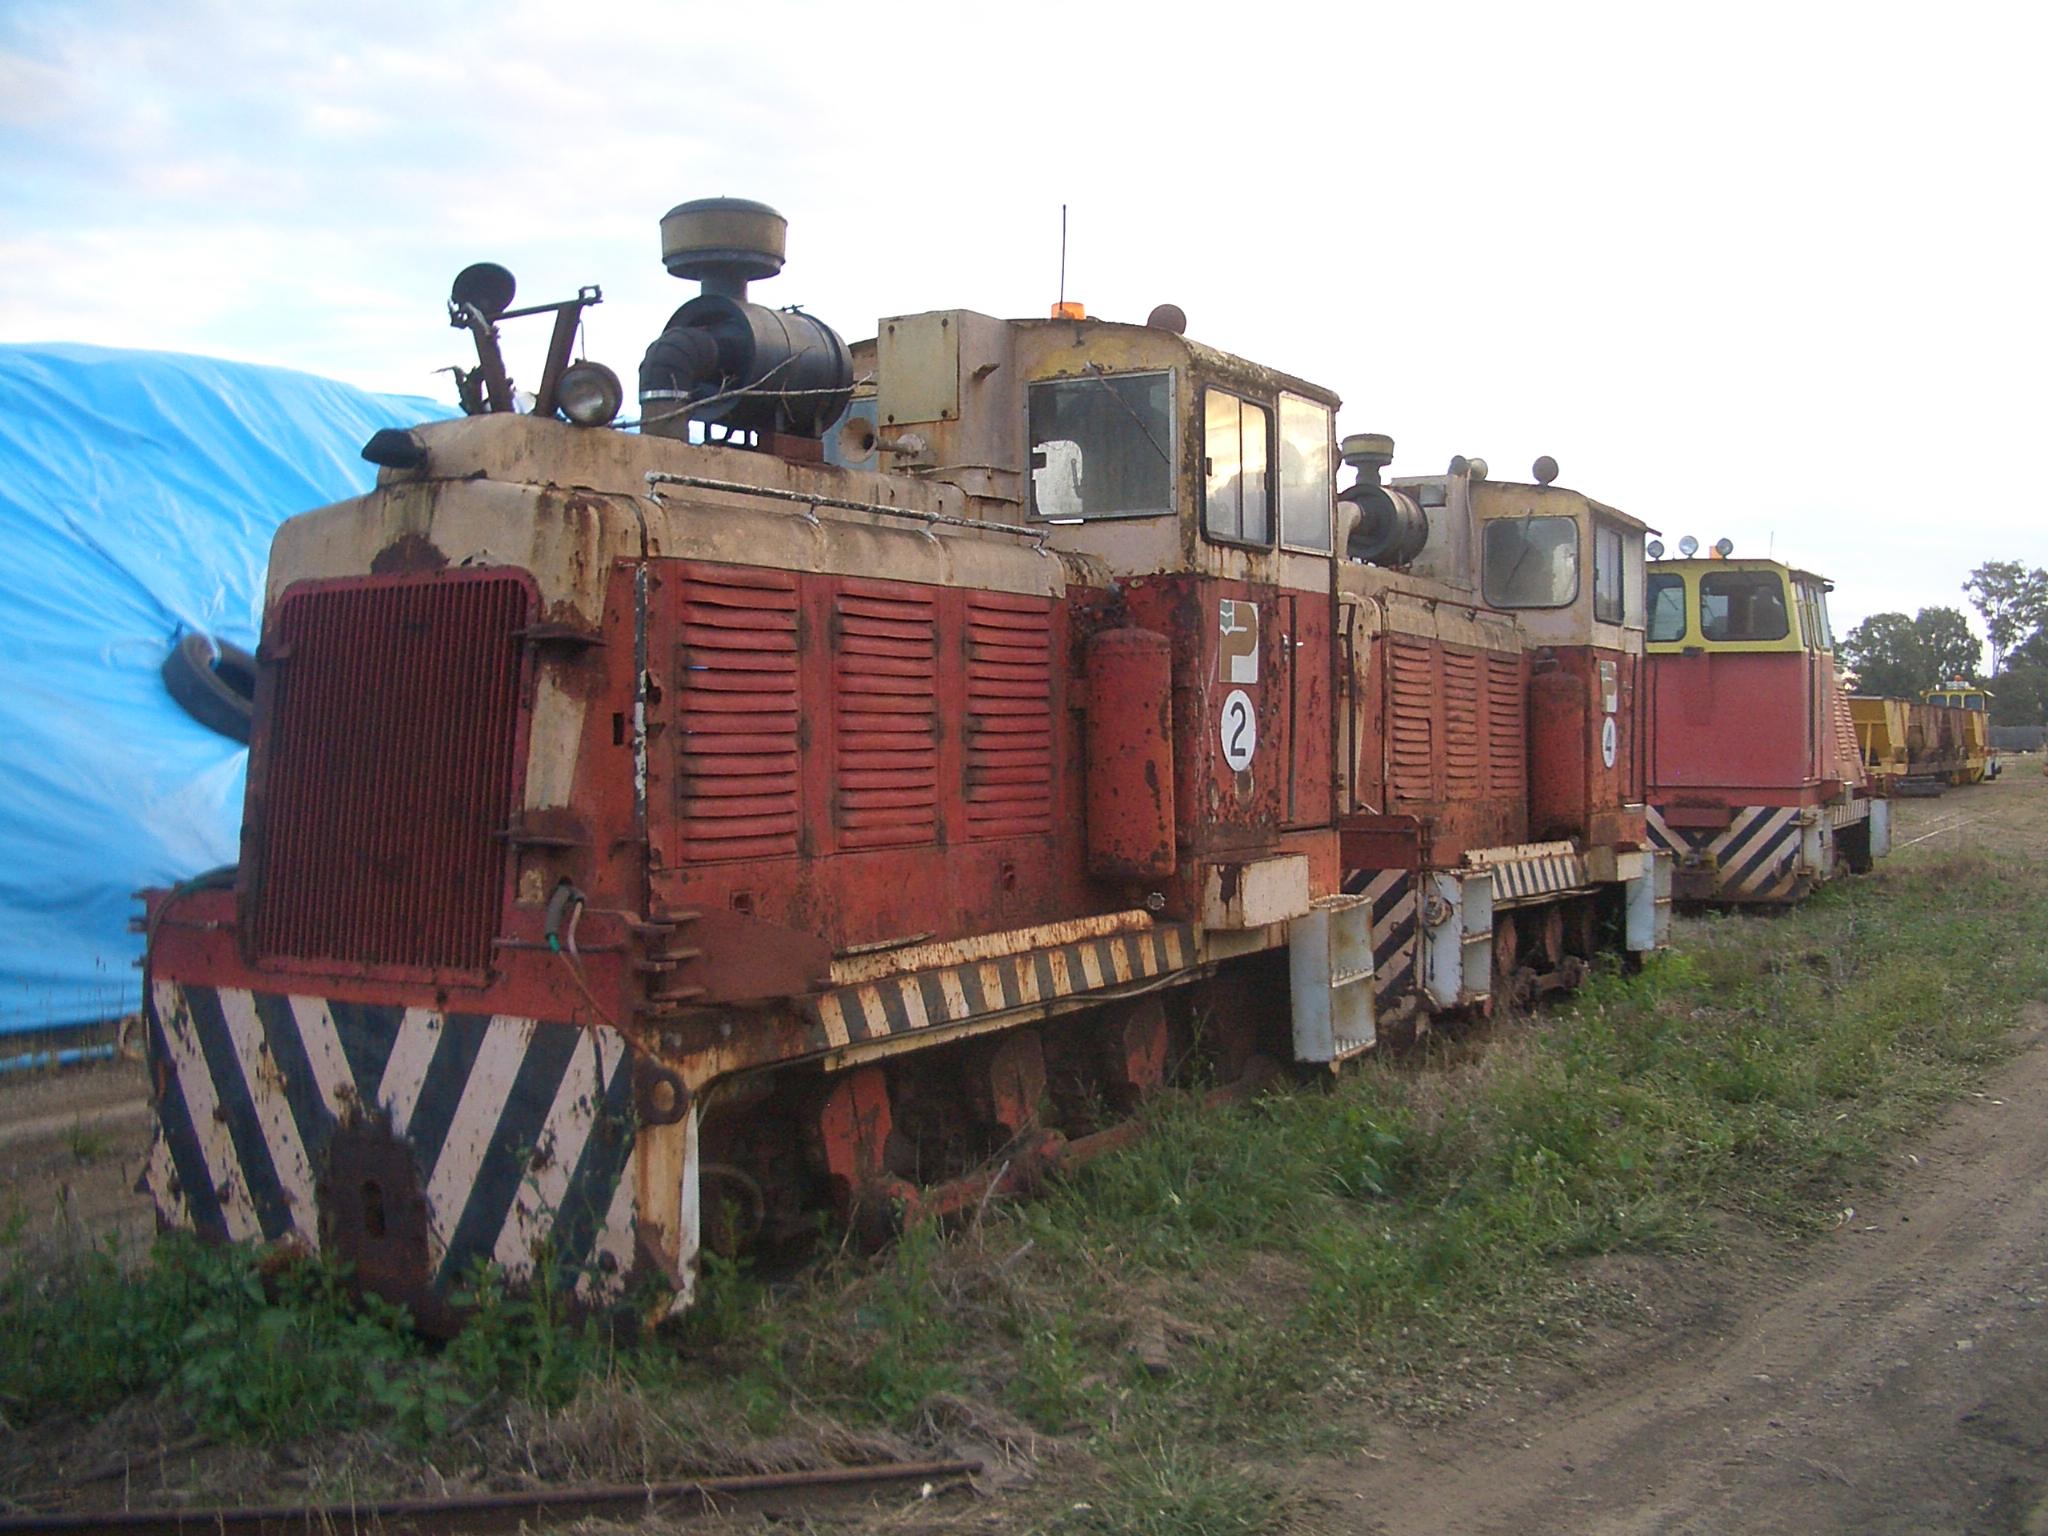 File:Proserpine-Sugar-Mill-old-loco-1296.jpg